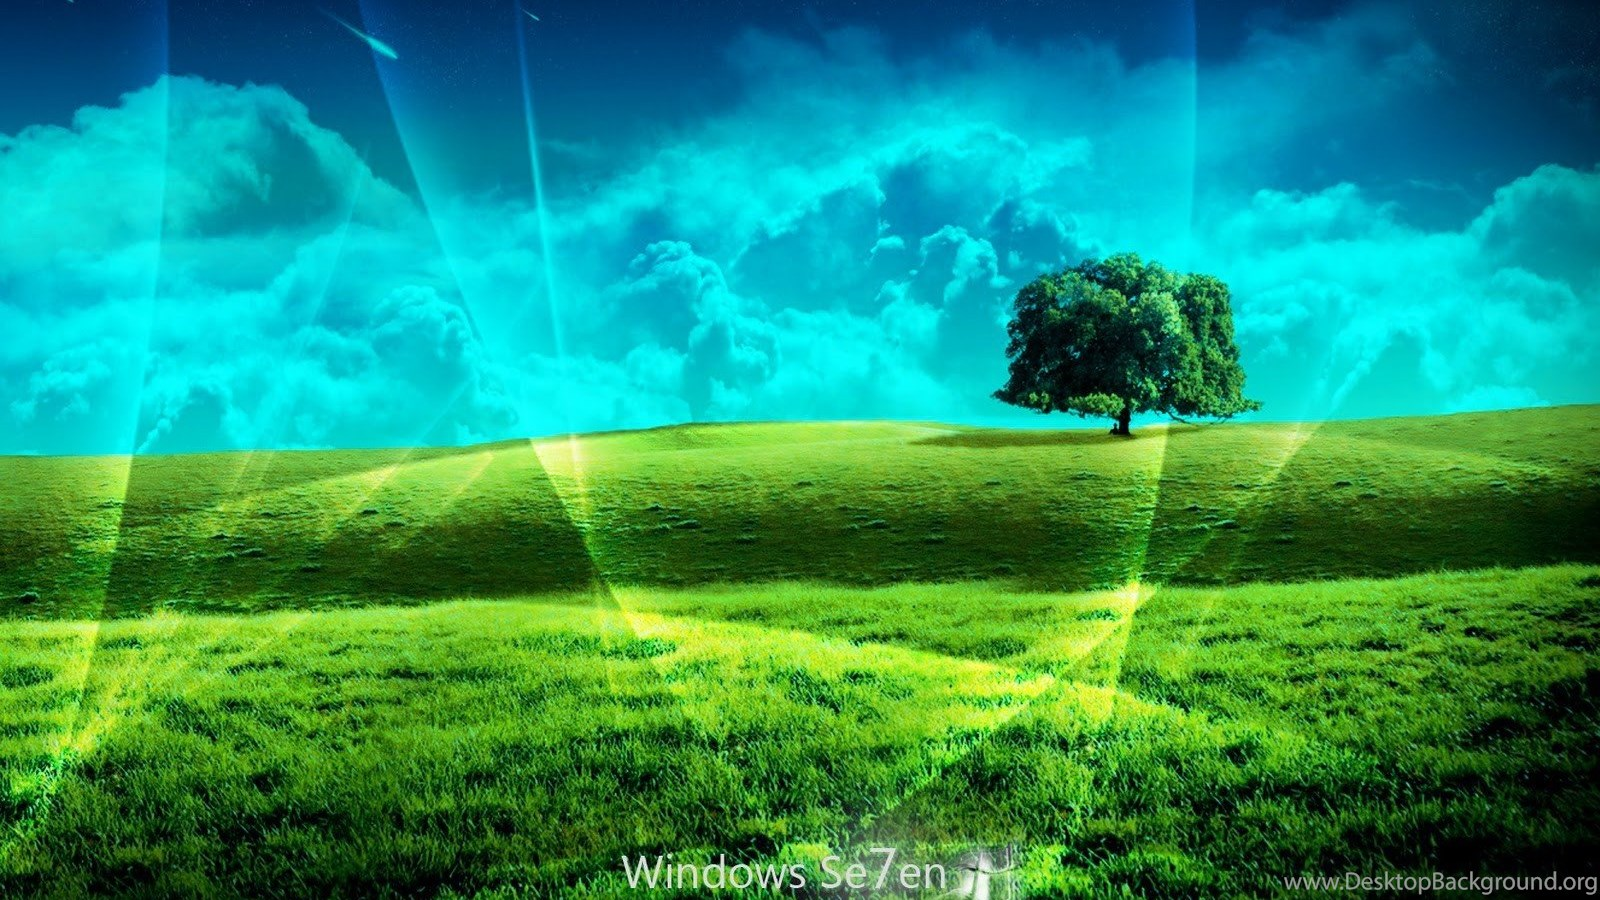 3d wallpapers for pc hd free download,desktop wallpapers desktop